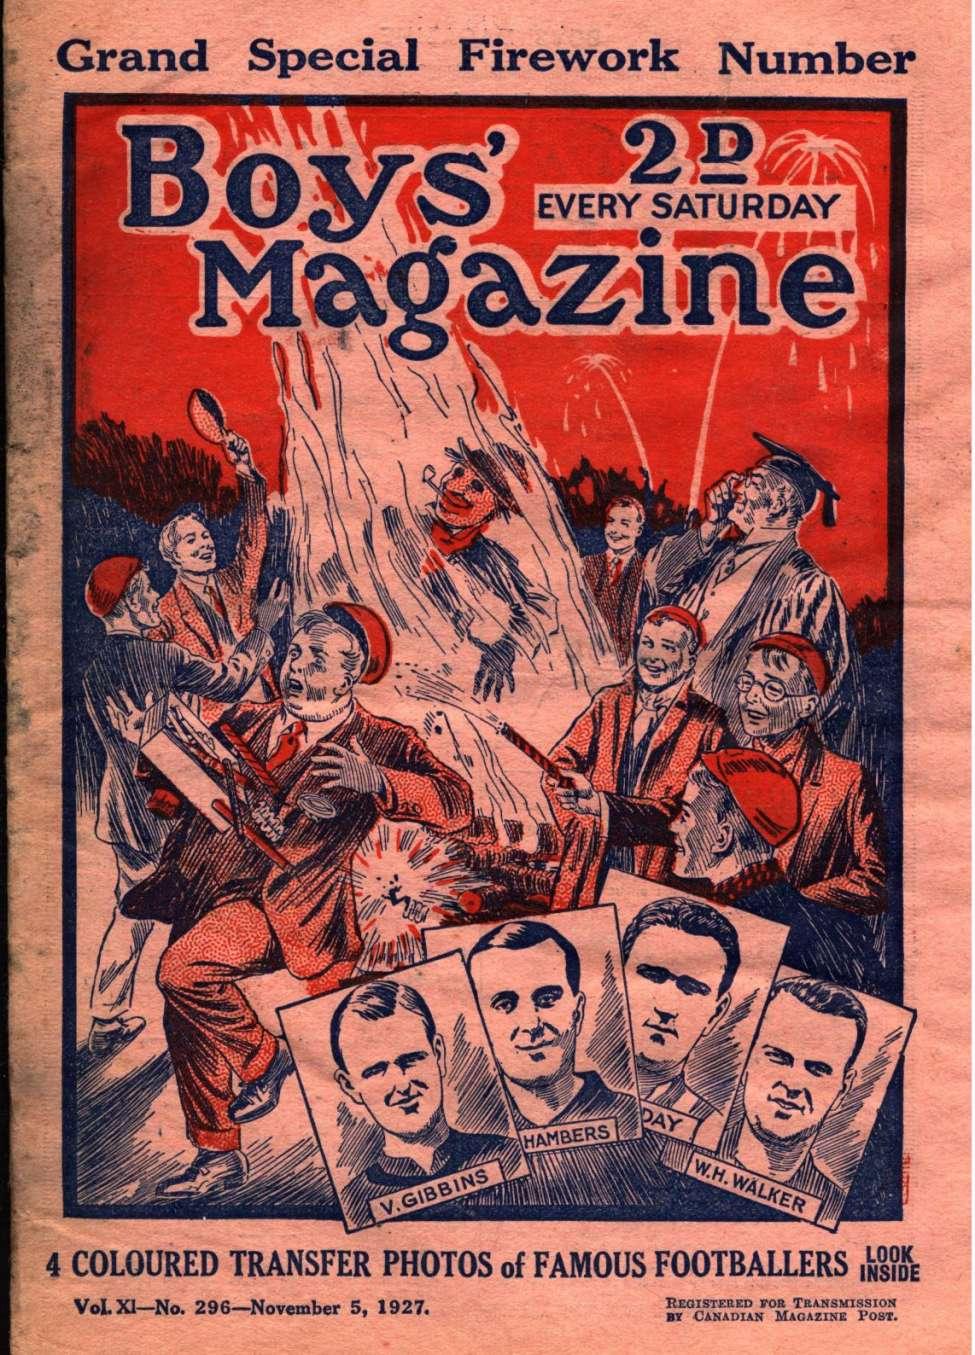 Comic Book Cover For Boys' Magazine 296